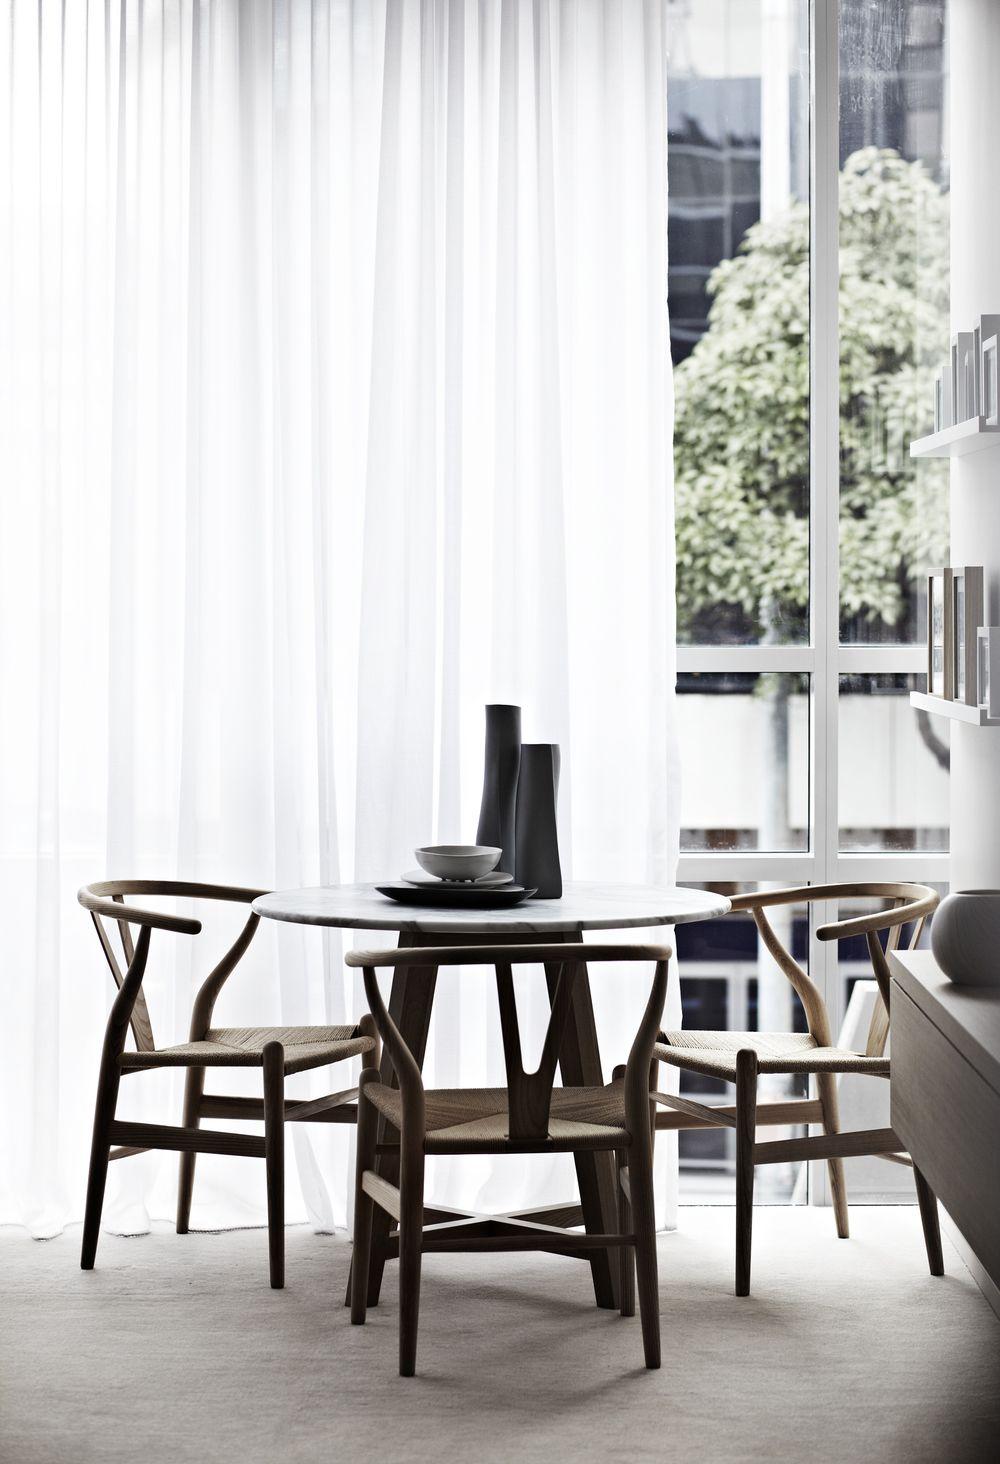 Wishbone chairs by hans j wegner from carl hansen s n for V dining room table